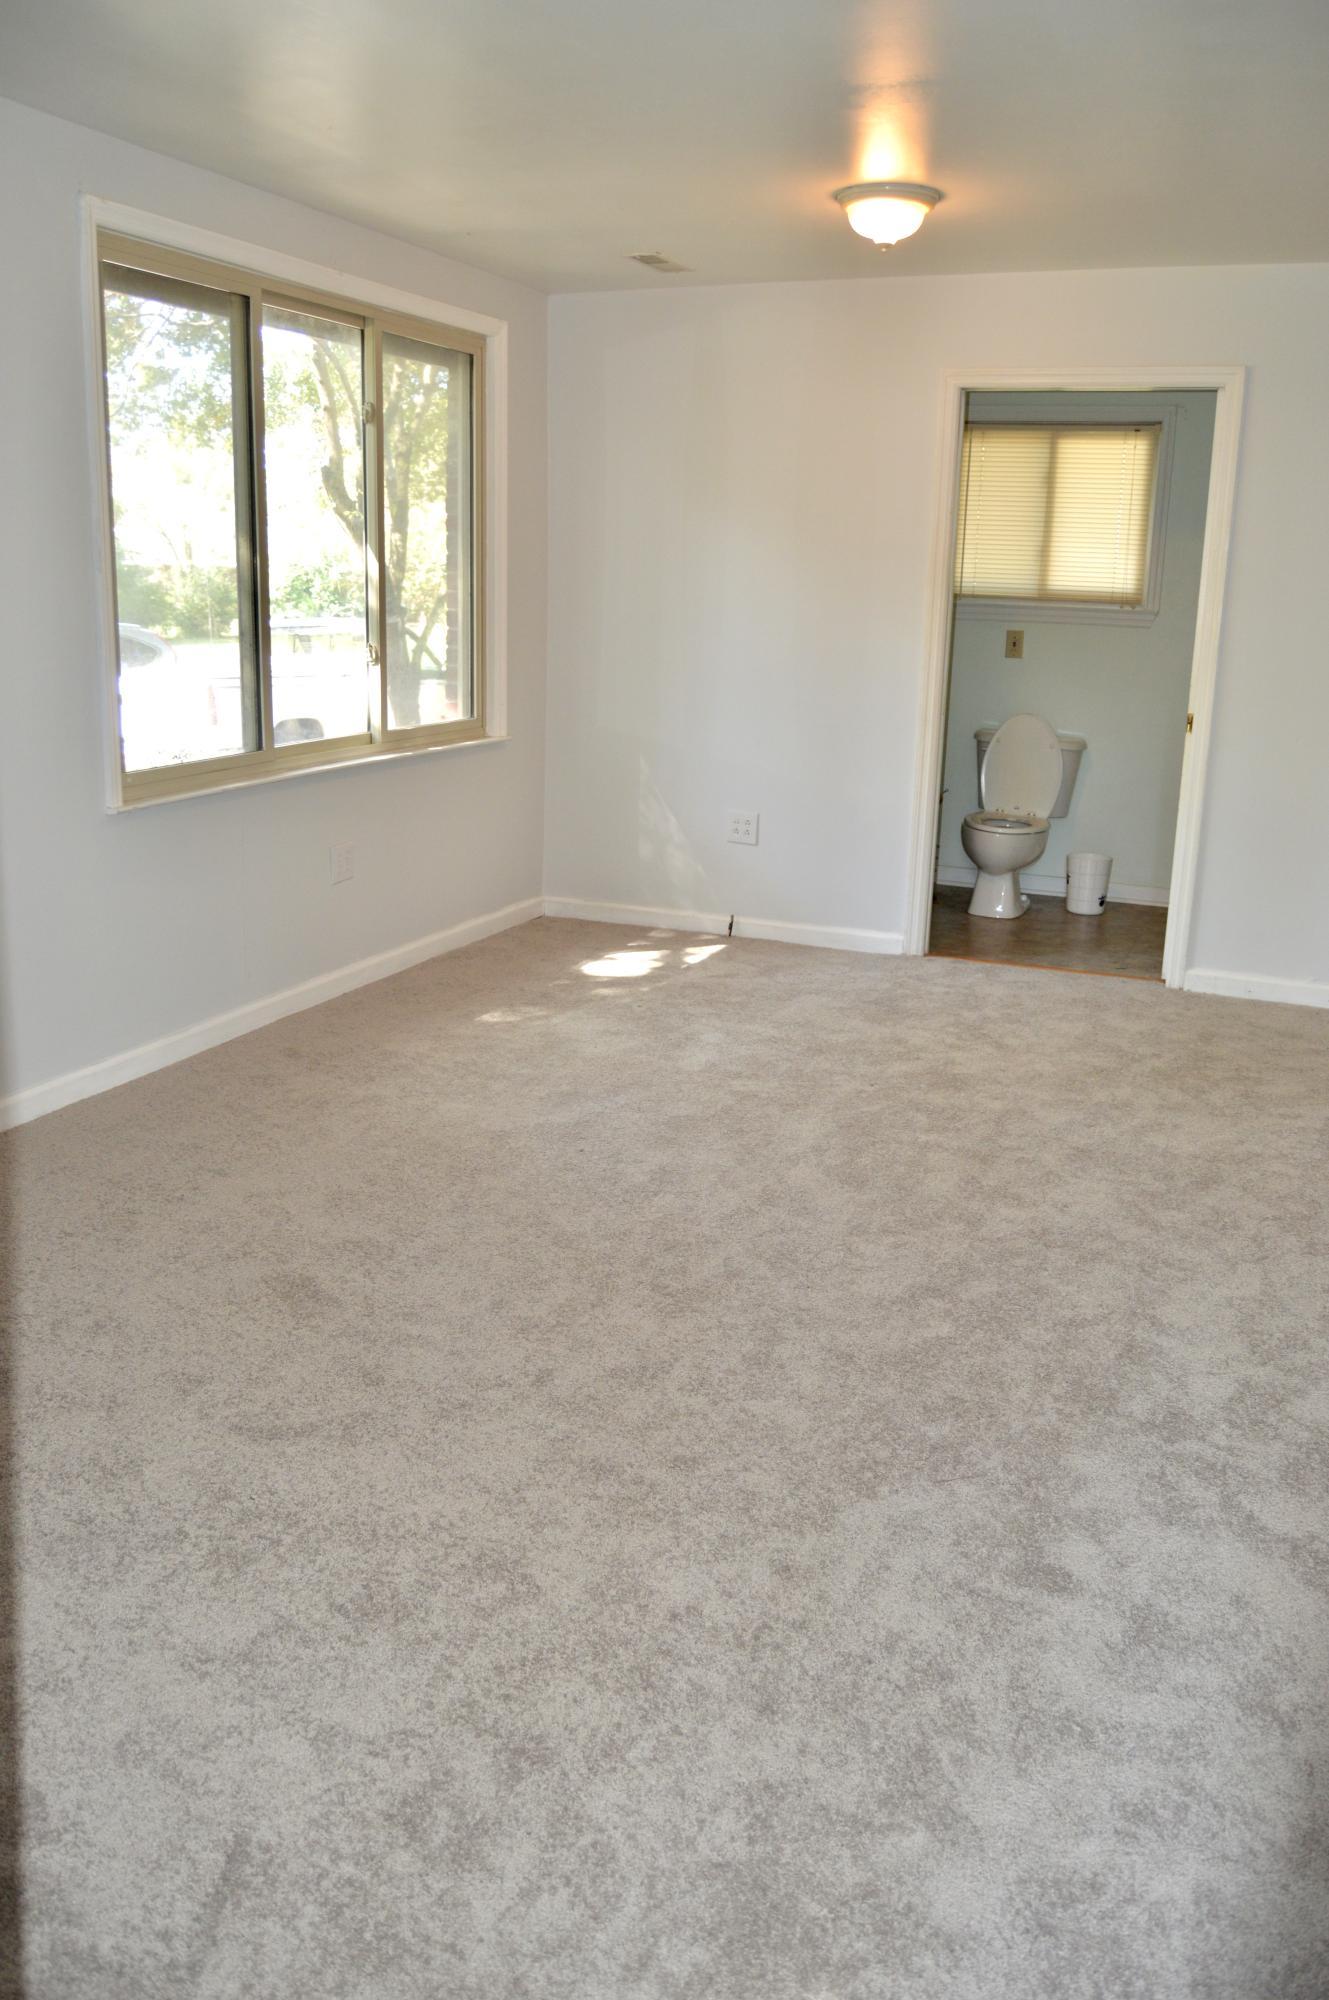 Owens Homes For Sale - 111 Owens, Summerville, SC - 17